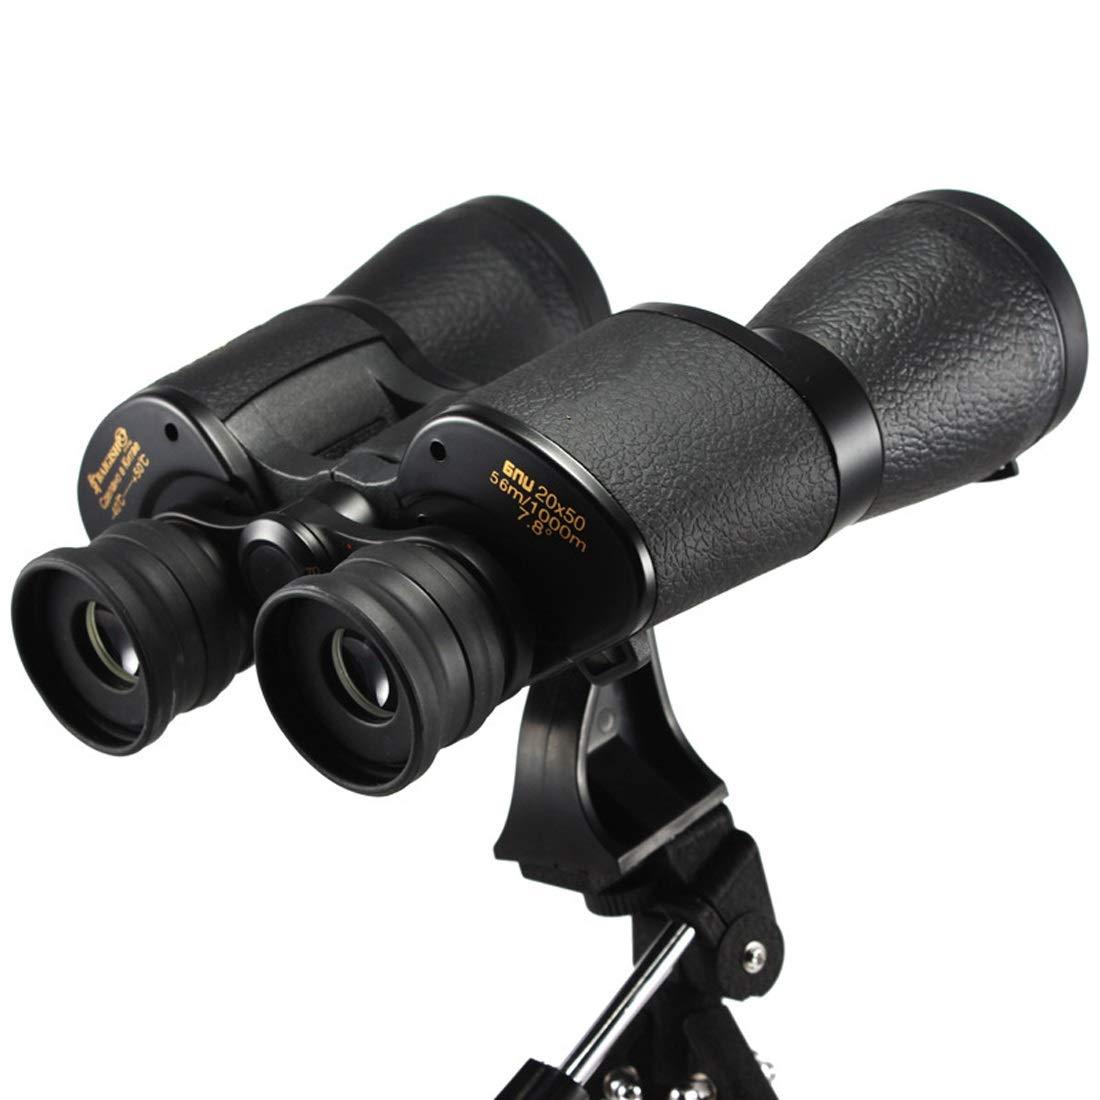 高速配送 CAFUTY 双眼望遠鏡 弱い光 望遠鏡 高倍率 夜間可視 望遠鏡 20x50 旅行 屋外用 アウトドア 双眼望遠鏡 旅行 B07JZJ8GGC, ウスイグン:858686af --- a0267596.xsph.ru